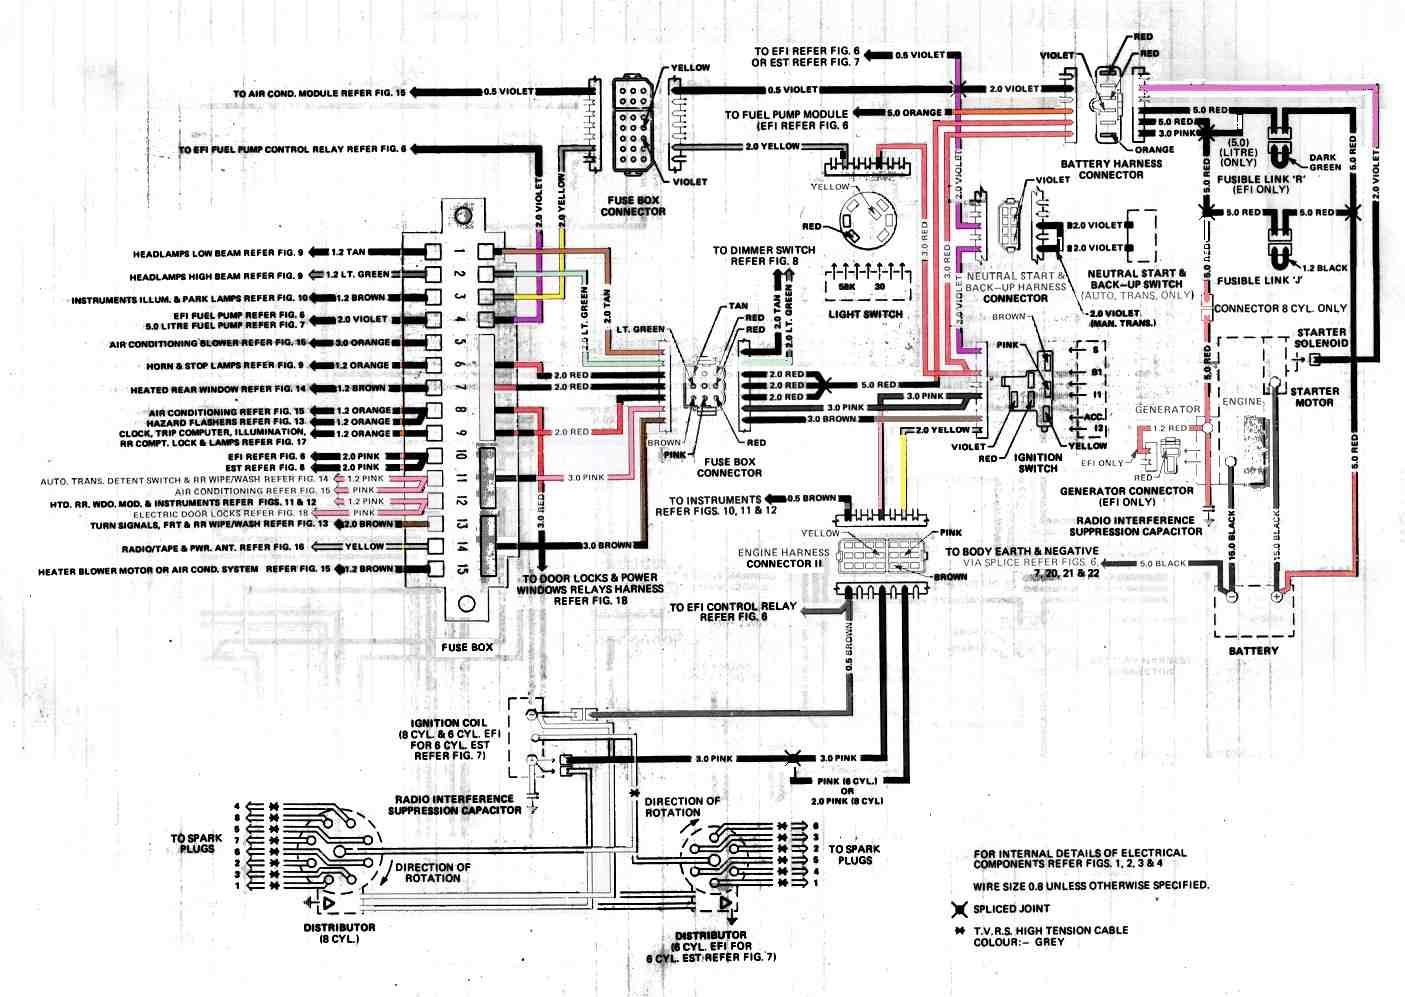 Holden Manuals Free Centurion 5500 Watt Generator Wiring Diagram Array 2011 Cruze Owners Manual Pdf Download Rh Appelfreelance Com